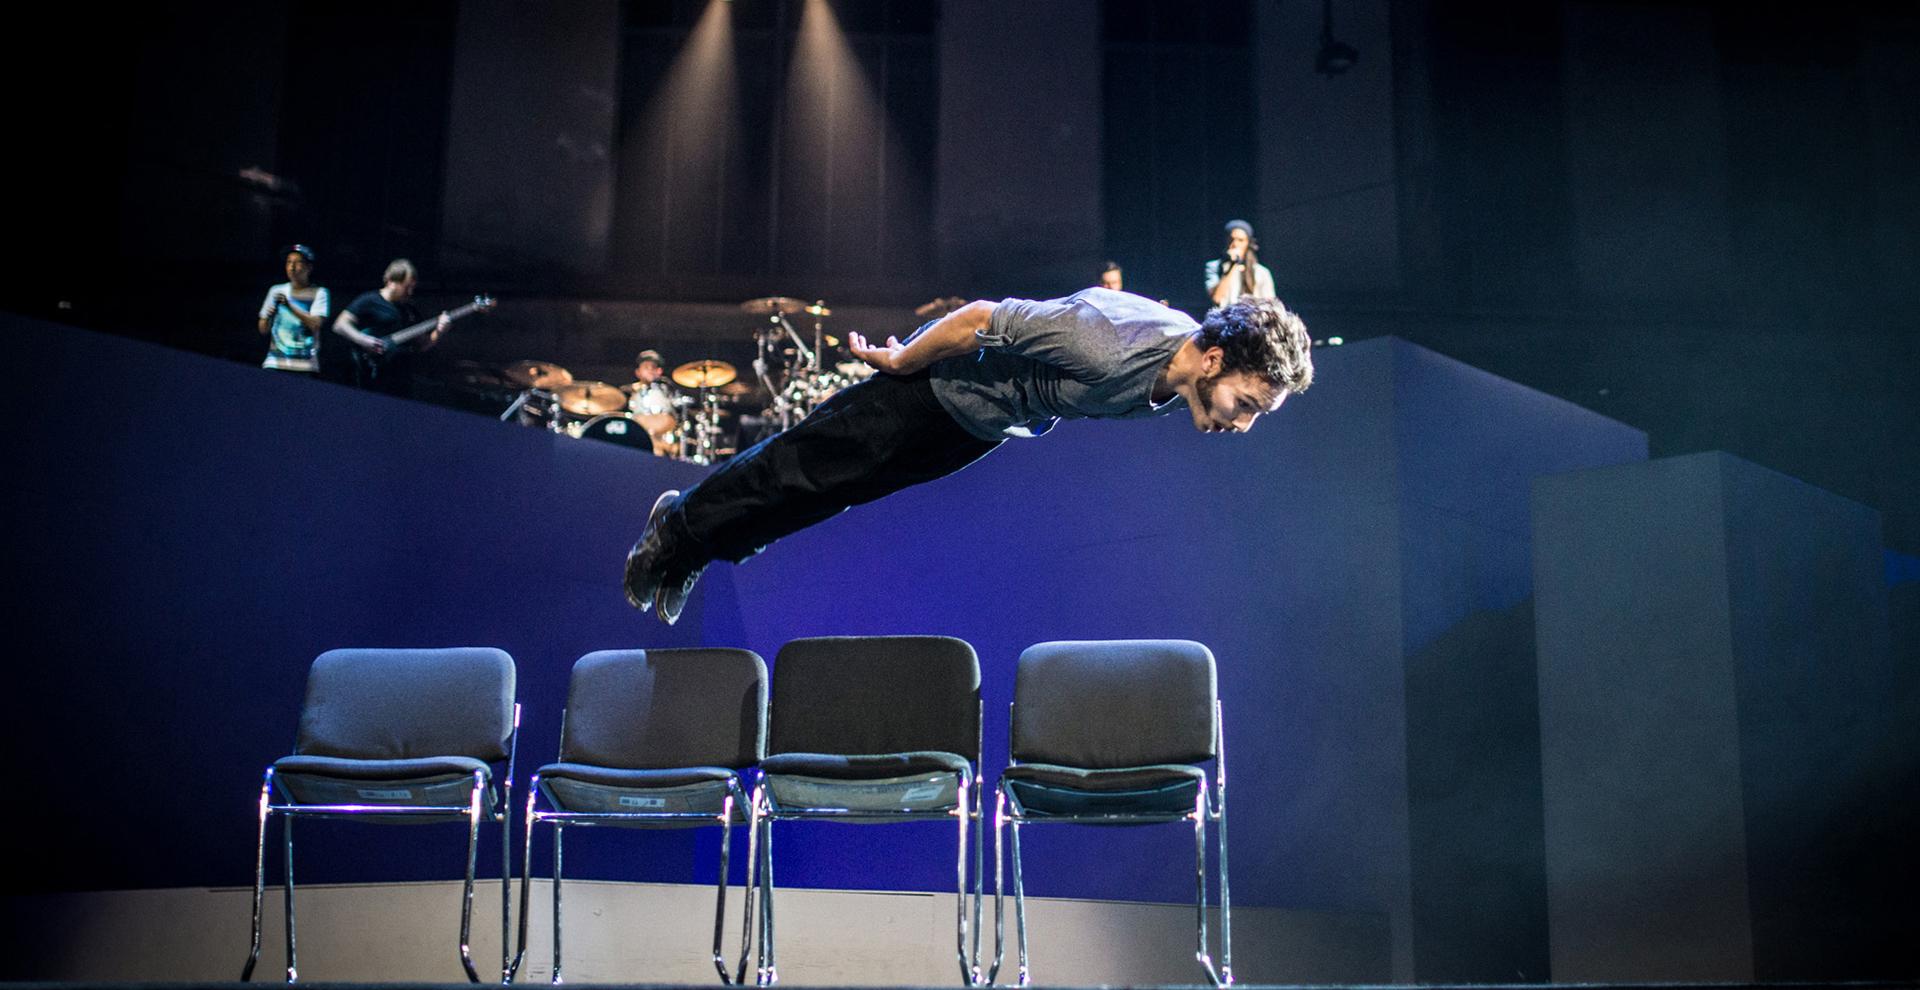 URBANATIX Show 2016 – DROP THE BEAT – AGENTUR DACAPO